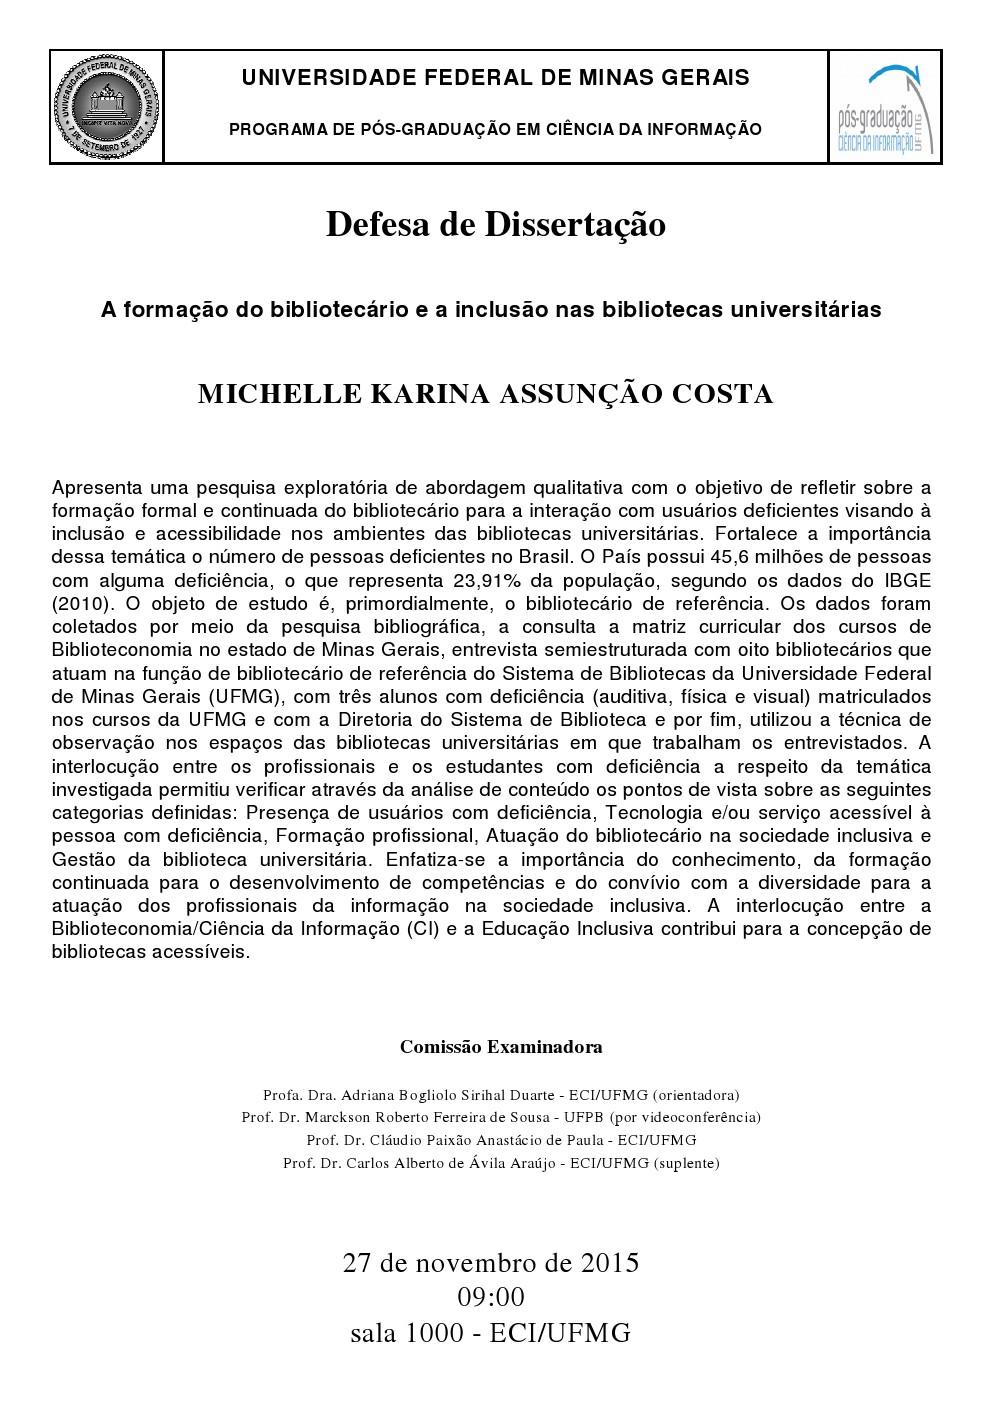 Defesa Michelle Karina Assunção Costa